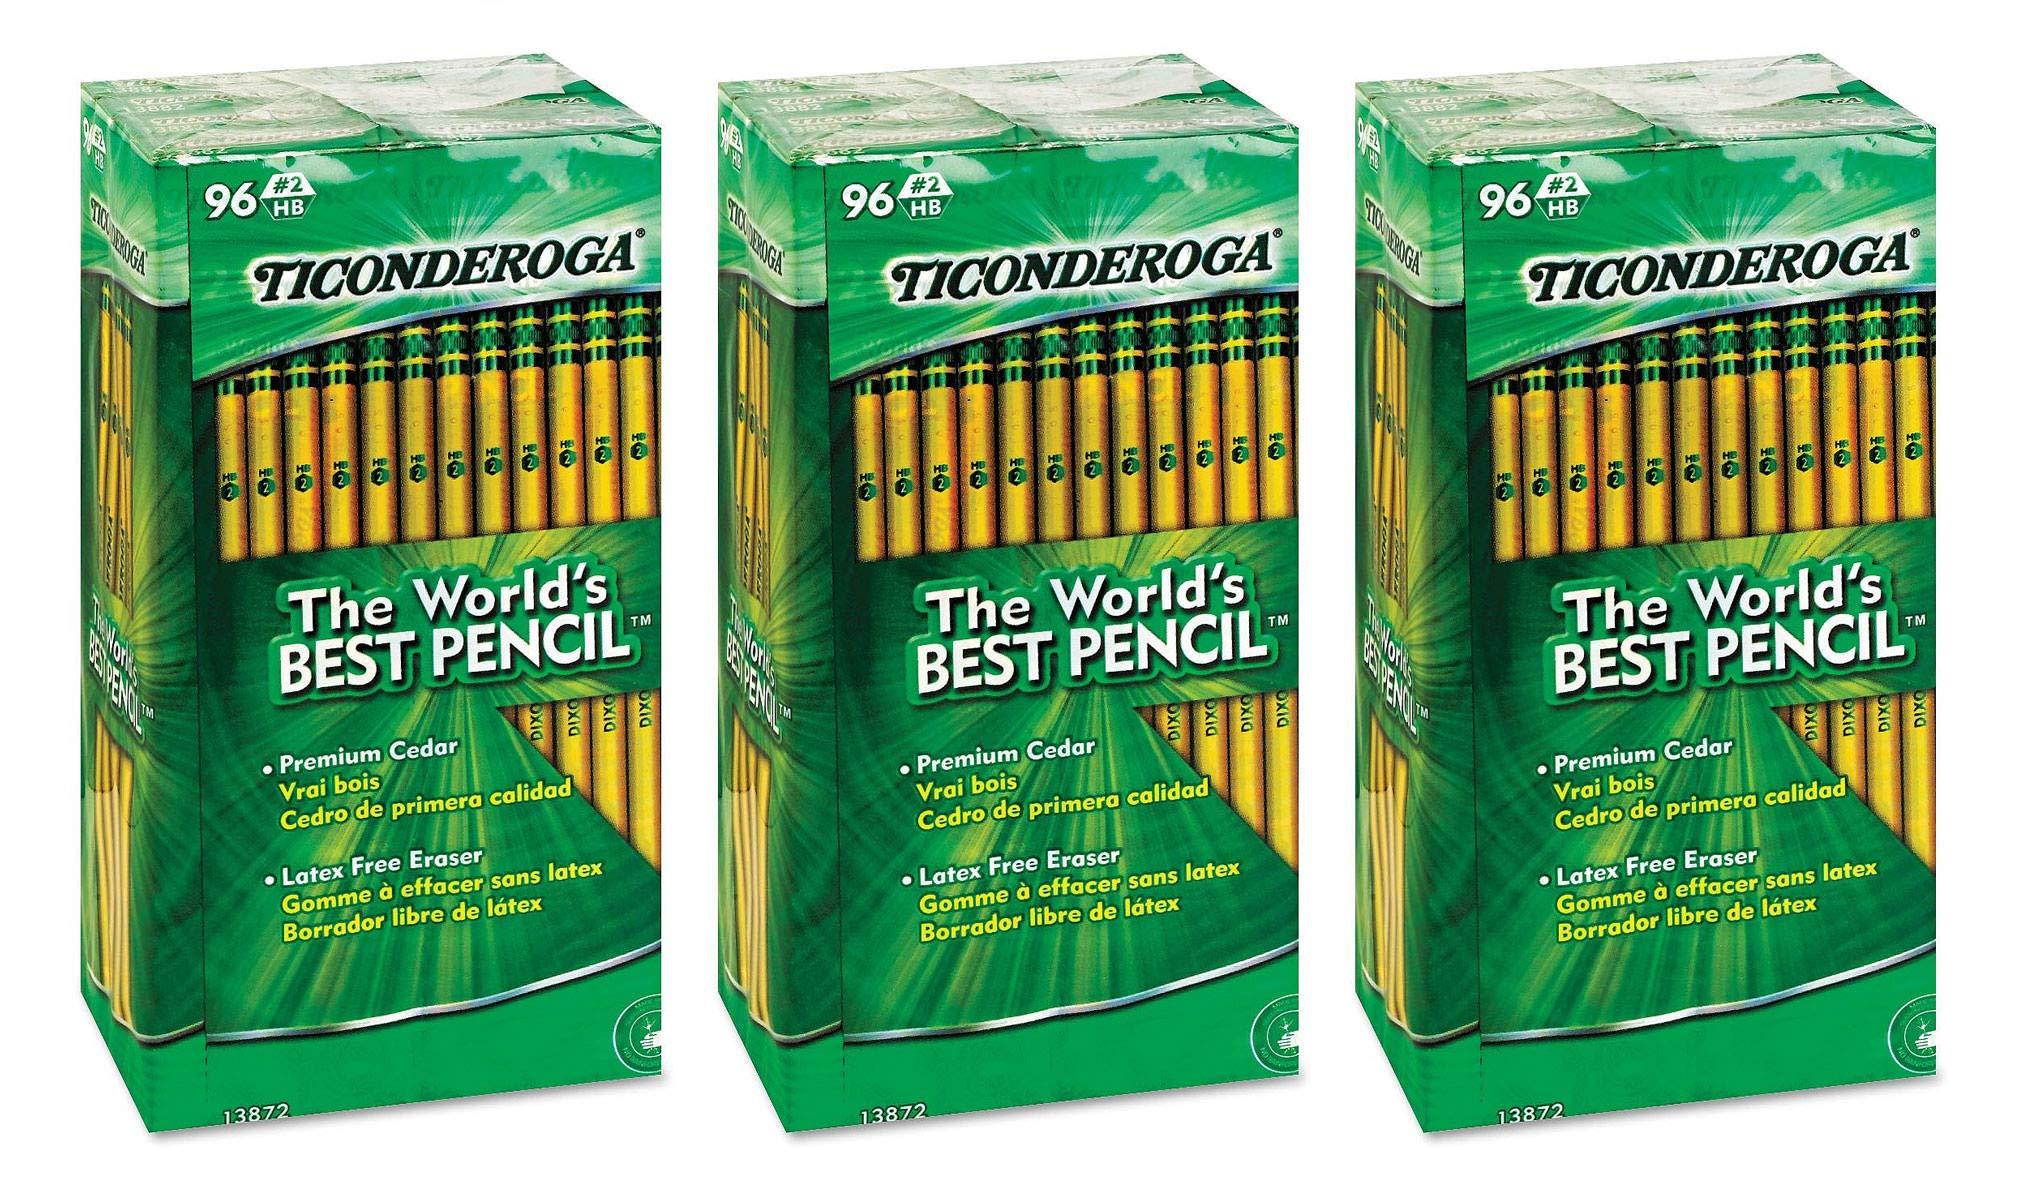 Dixon MDHCHG Woodcase Pencil, HB #2, Yellow Barrel, 96/Pack 3 Pack